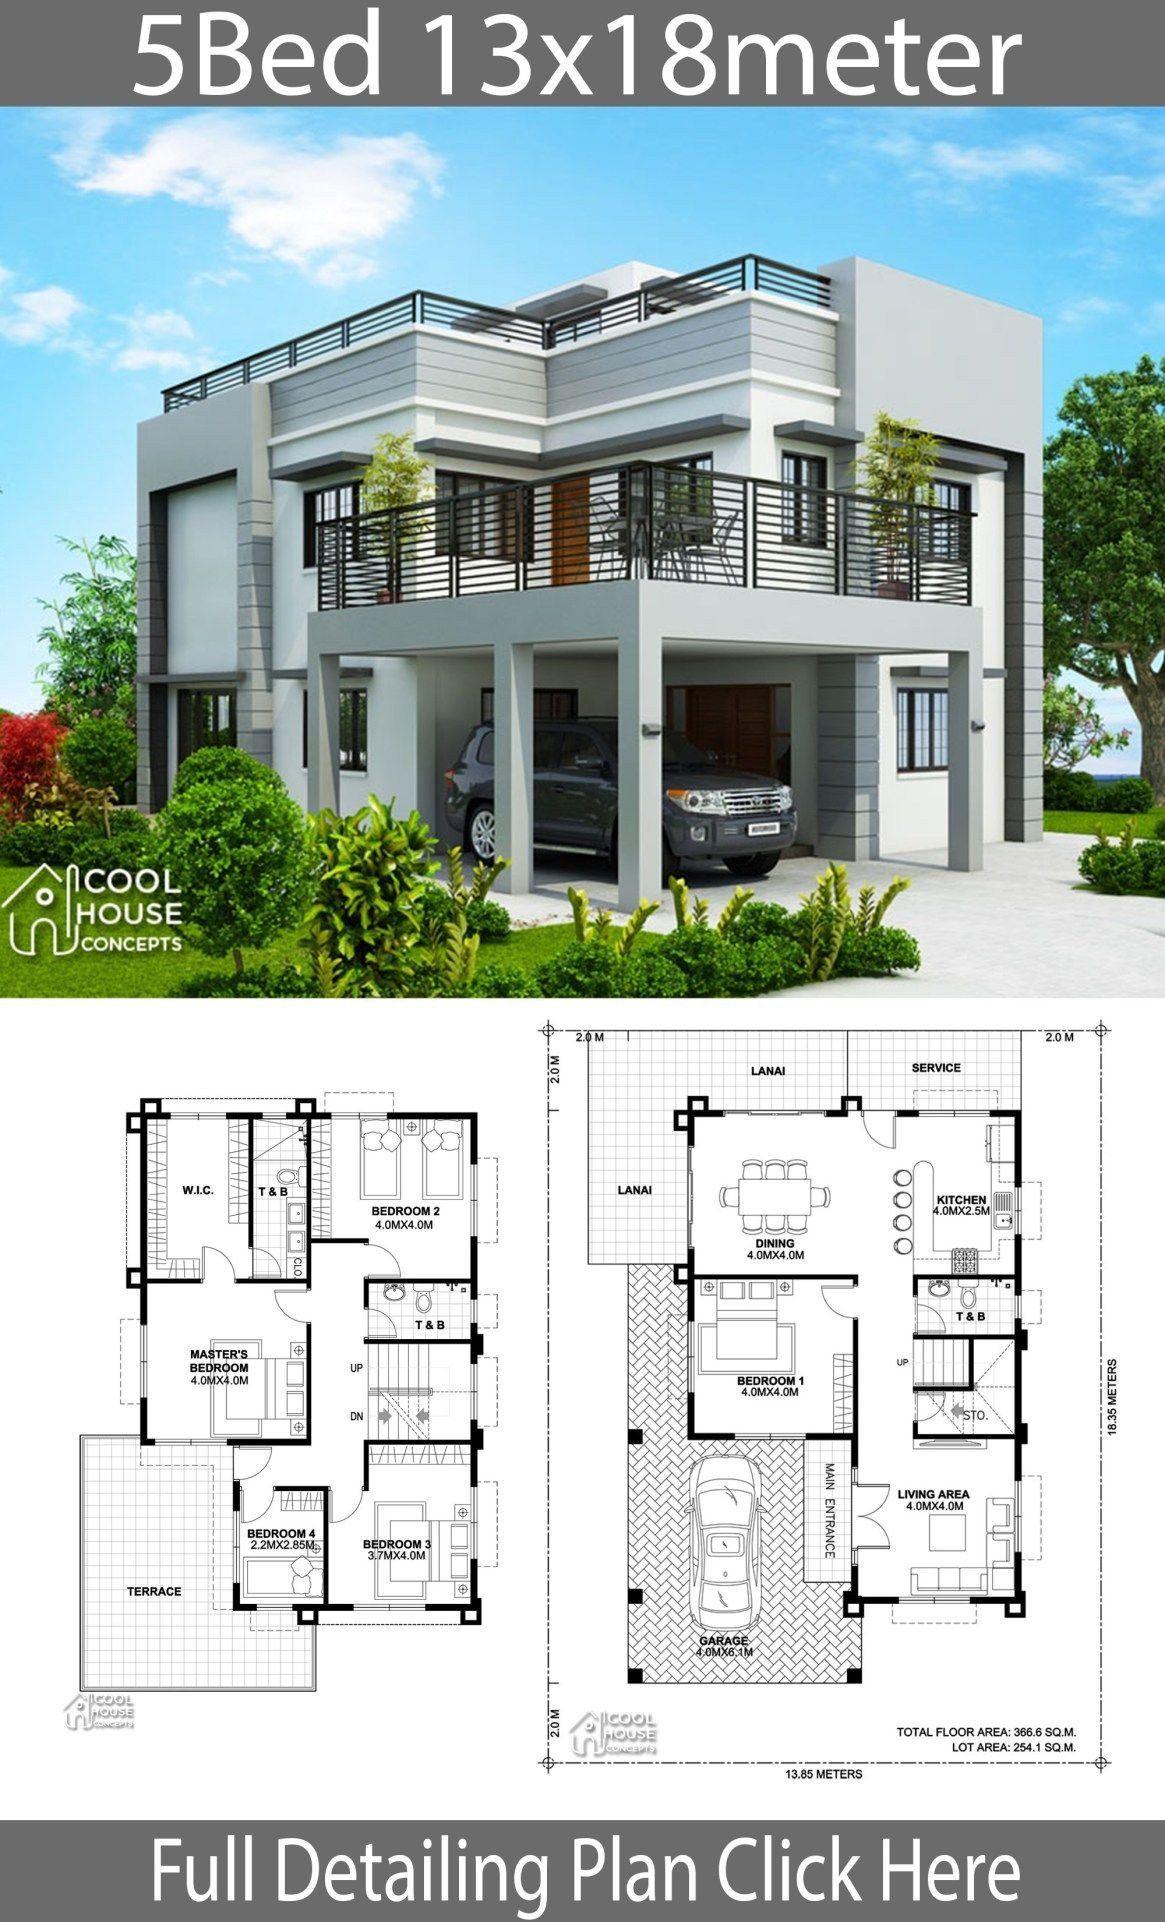 Modern House Layout Plans Home Design Plan 13x18m With 5 Bedrooms Model House Plan Modern House Plans Architect Design House